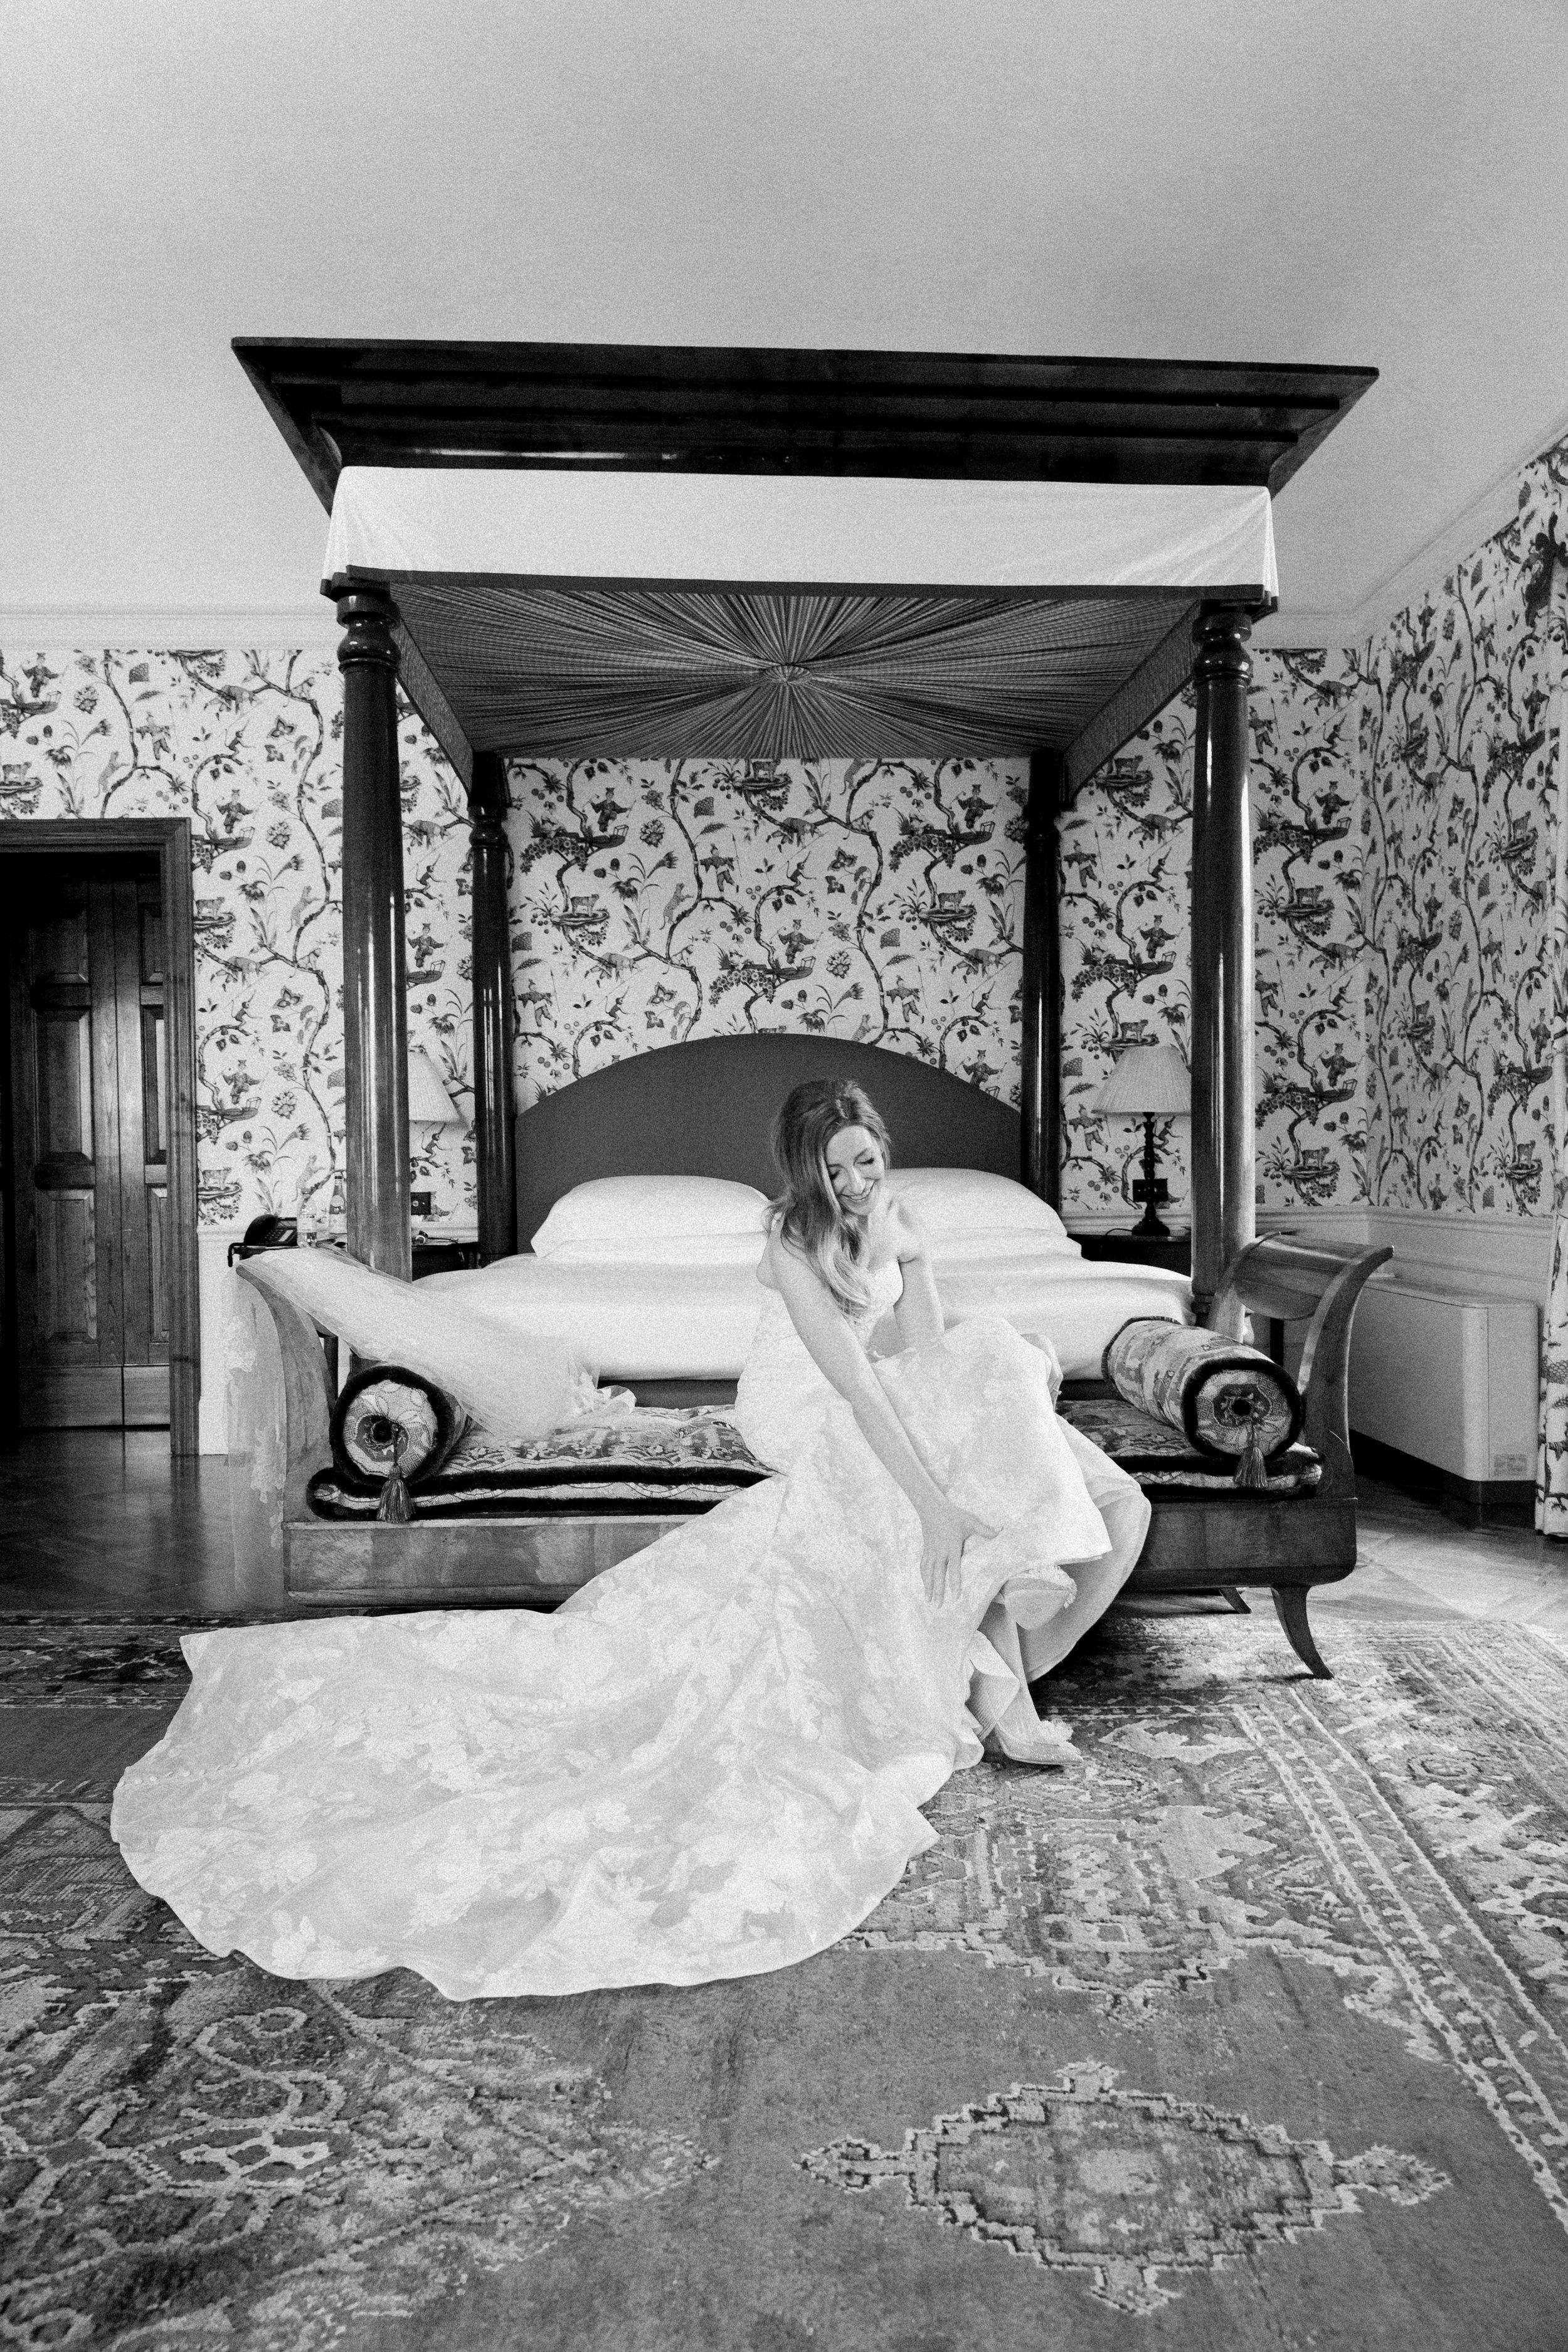 Bonphotage Chicago and Destination Fine Art Wedding Photography - Tuscany, Italy - Il Borro